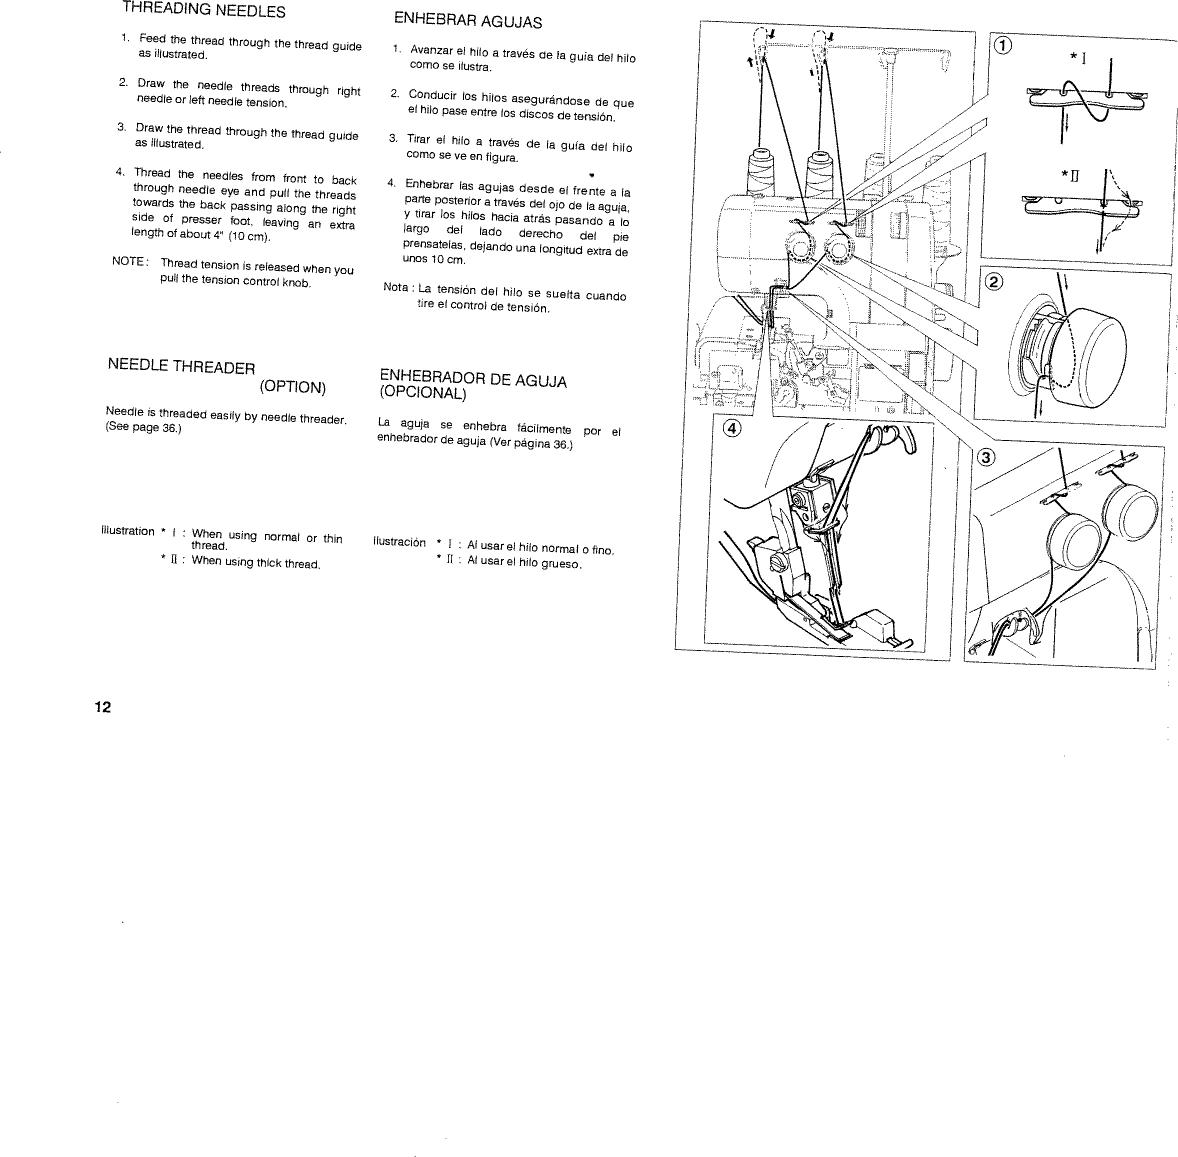 White Speedylock 1300De Users Manual